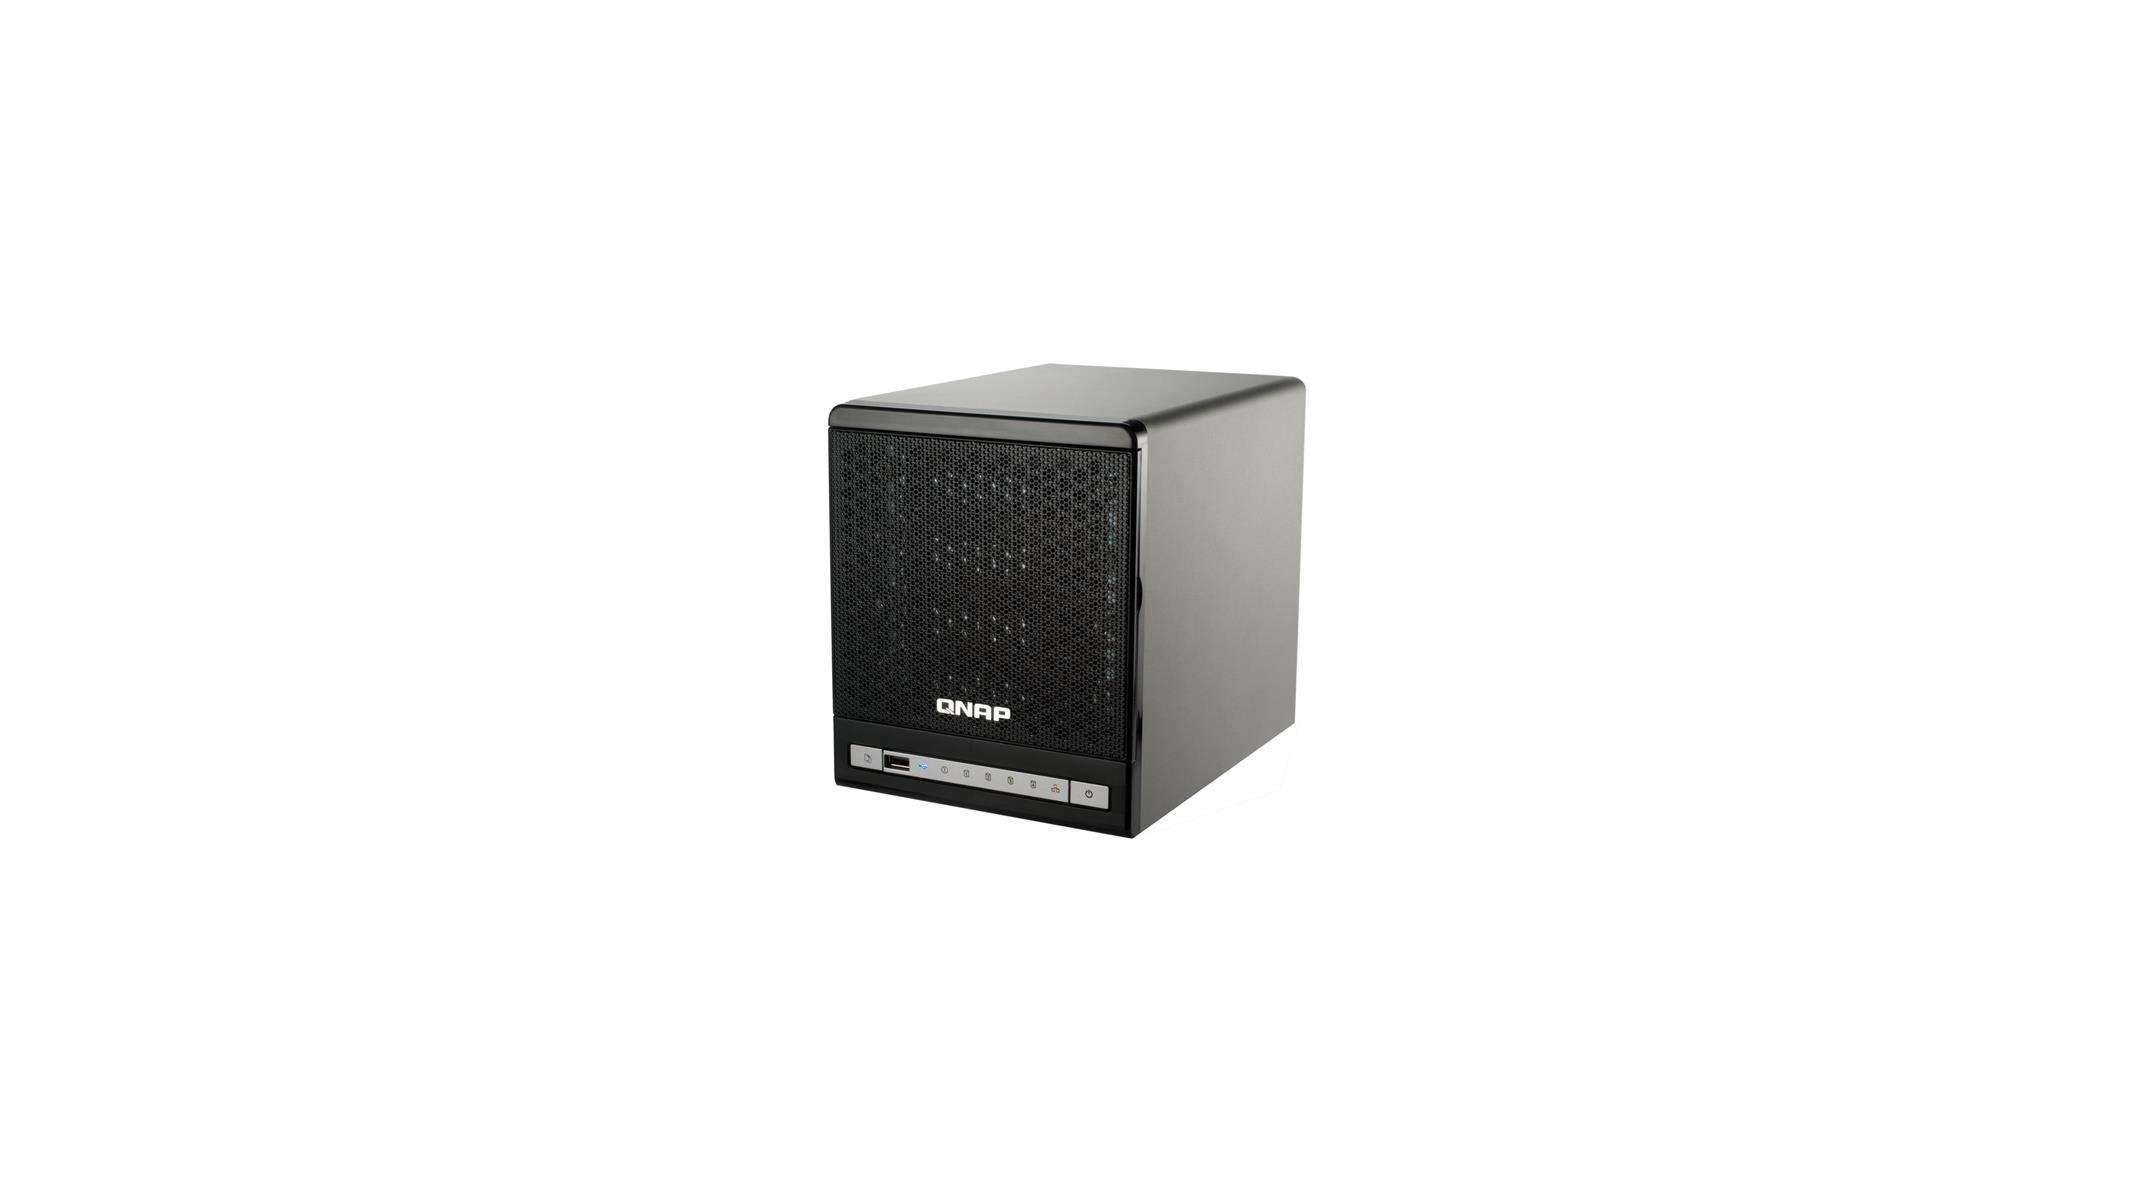 QNAP Brings Debian Lenny To Turbo NAS Drives | HotHardware